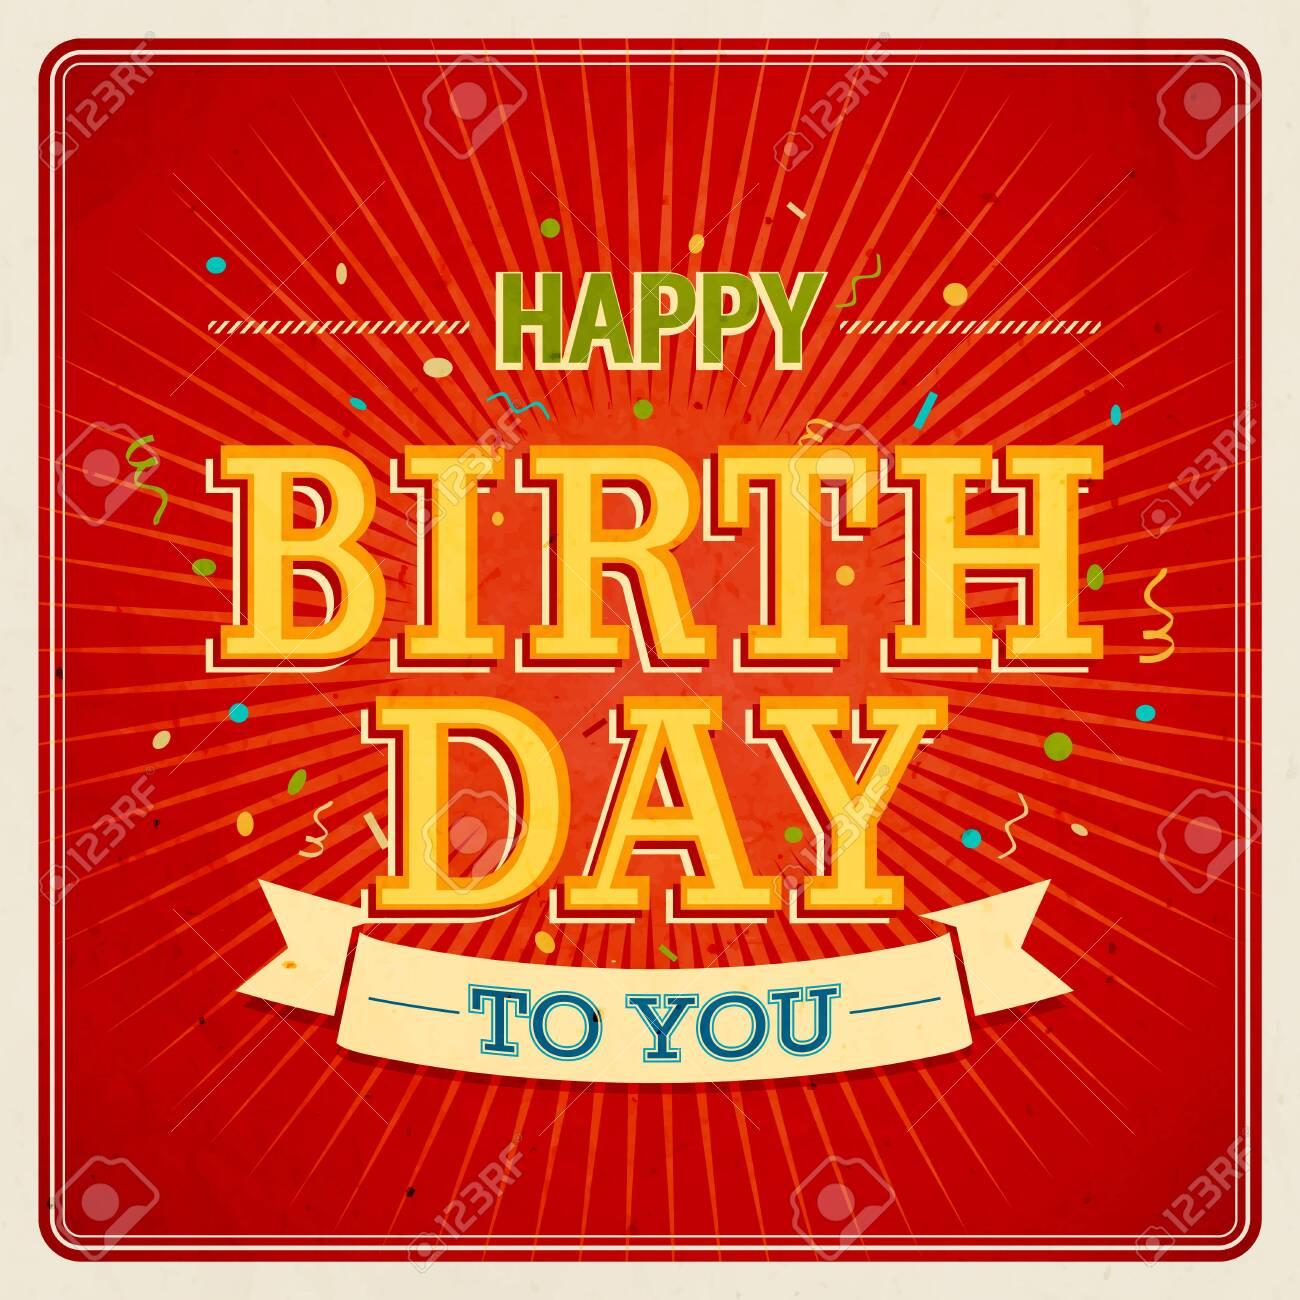 Vintage card - Happy birthday. Vector illustration. - 26935165